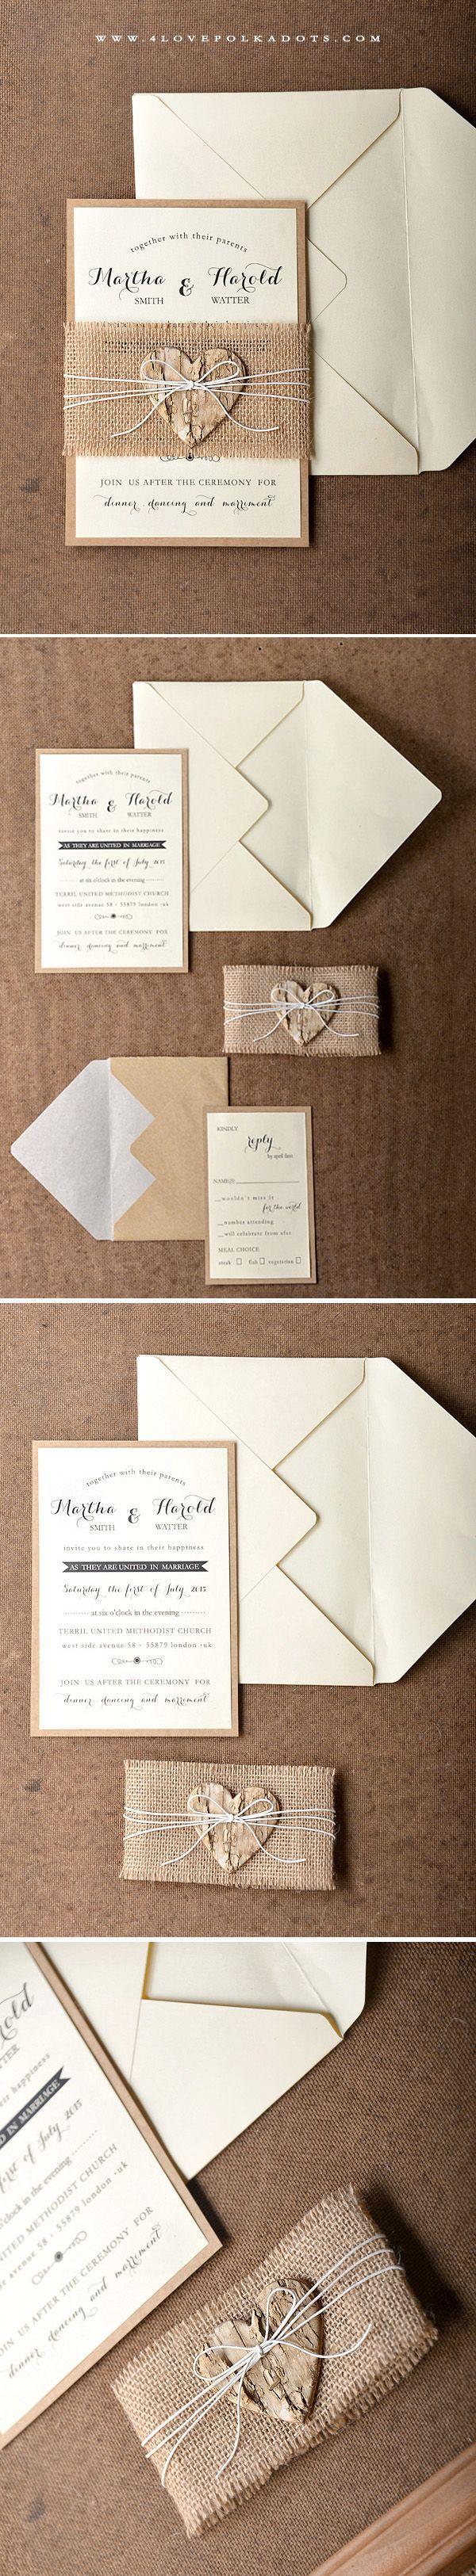 Handmade Rustic Wedding Invitation Ideas: Wedding invitations ...